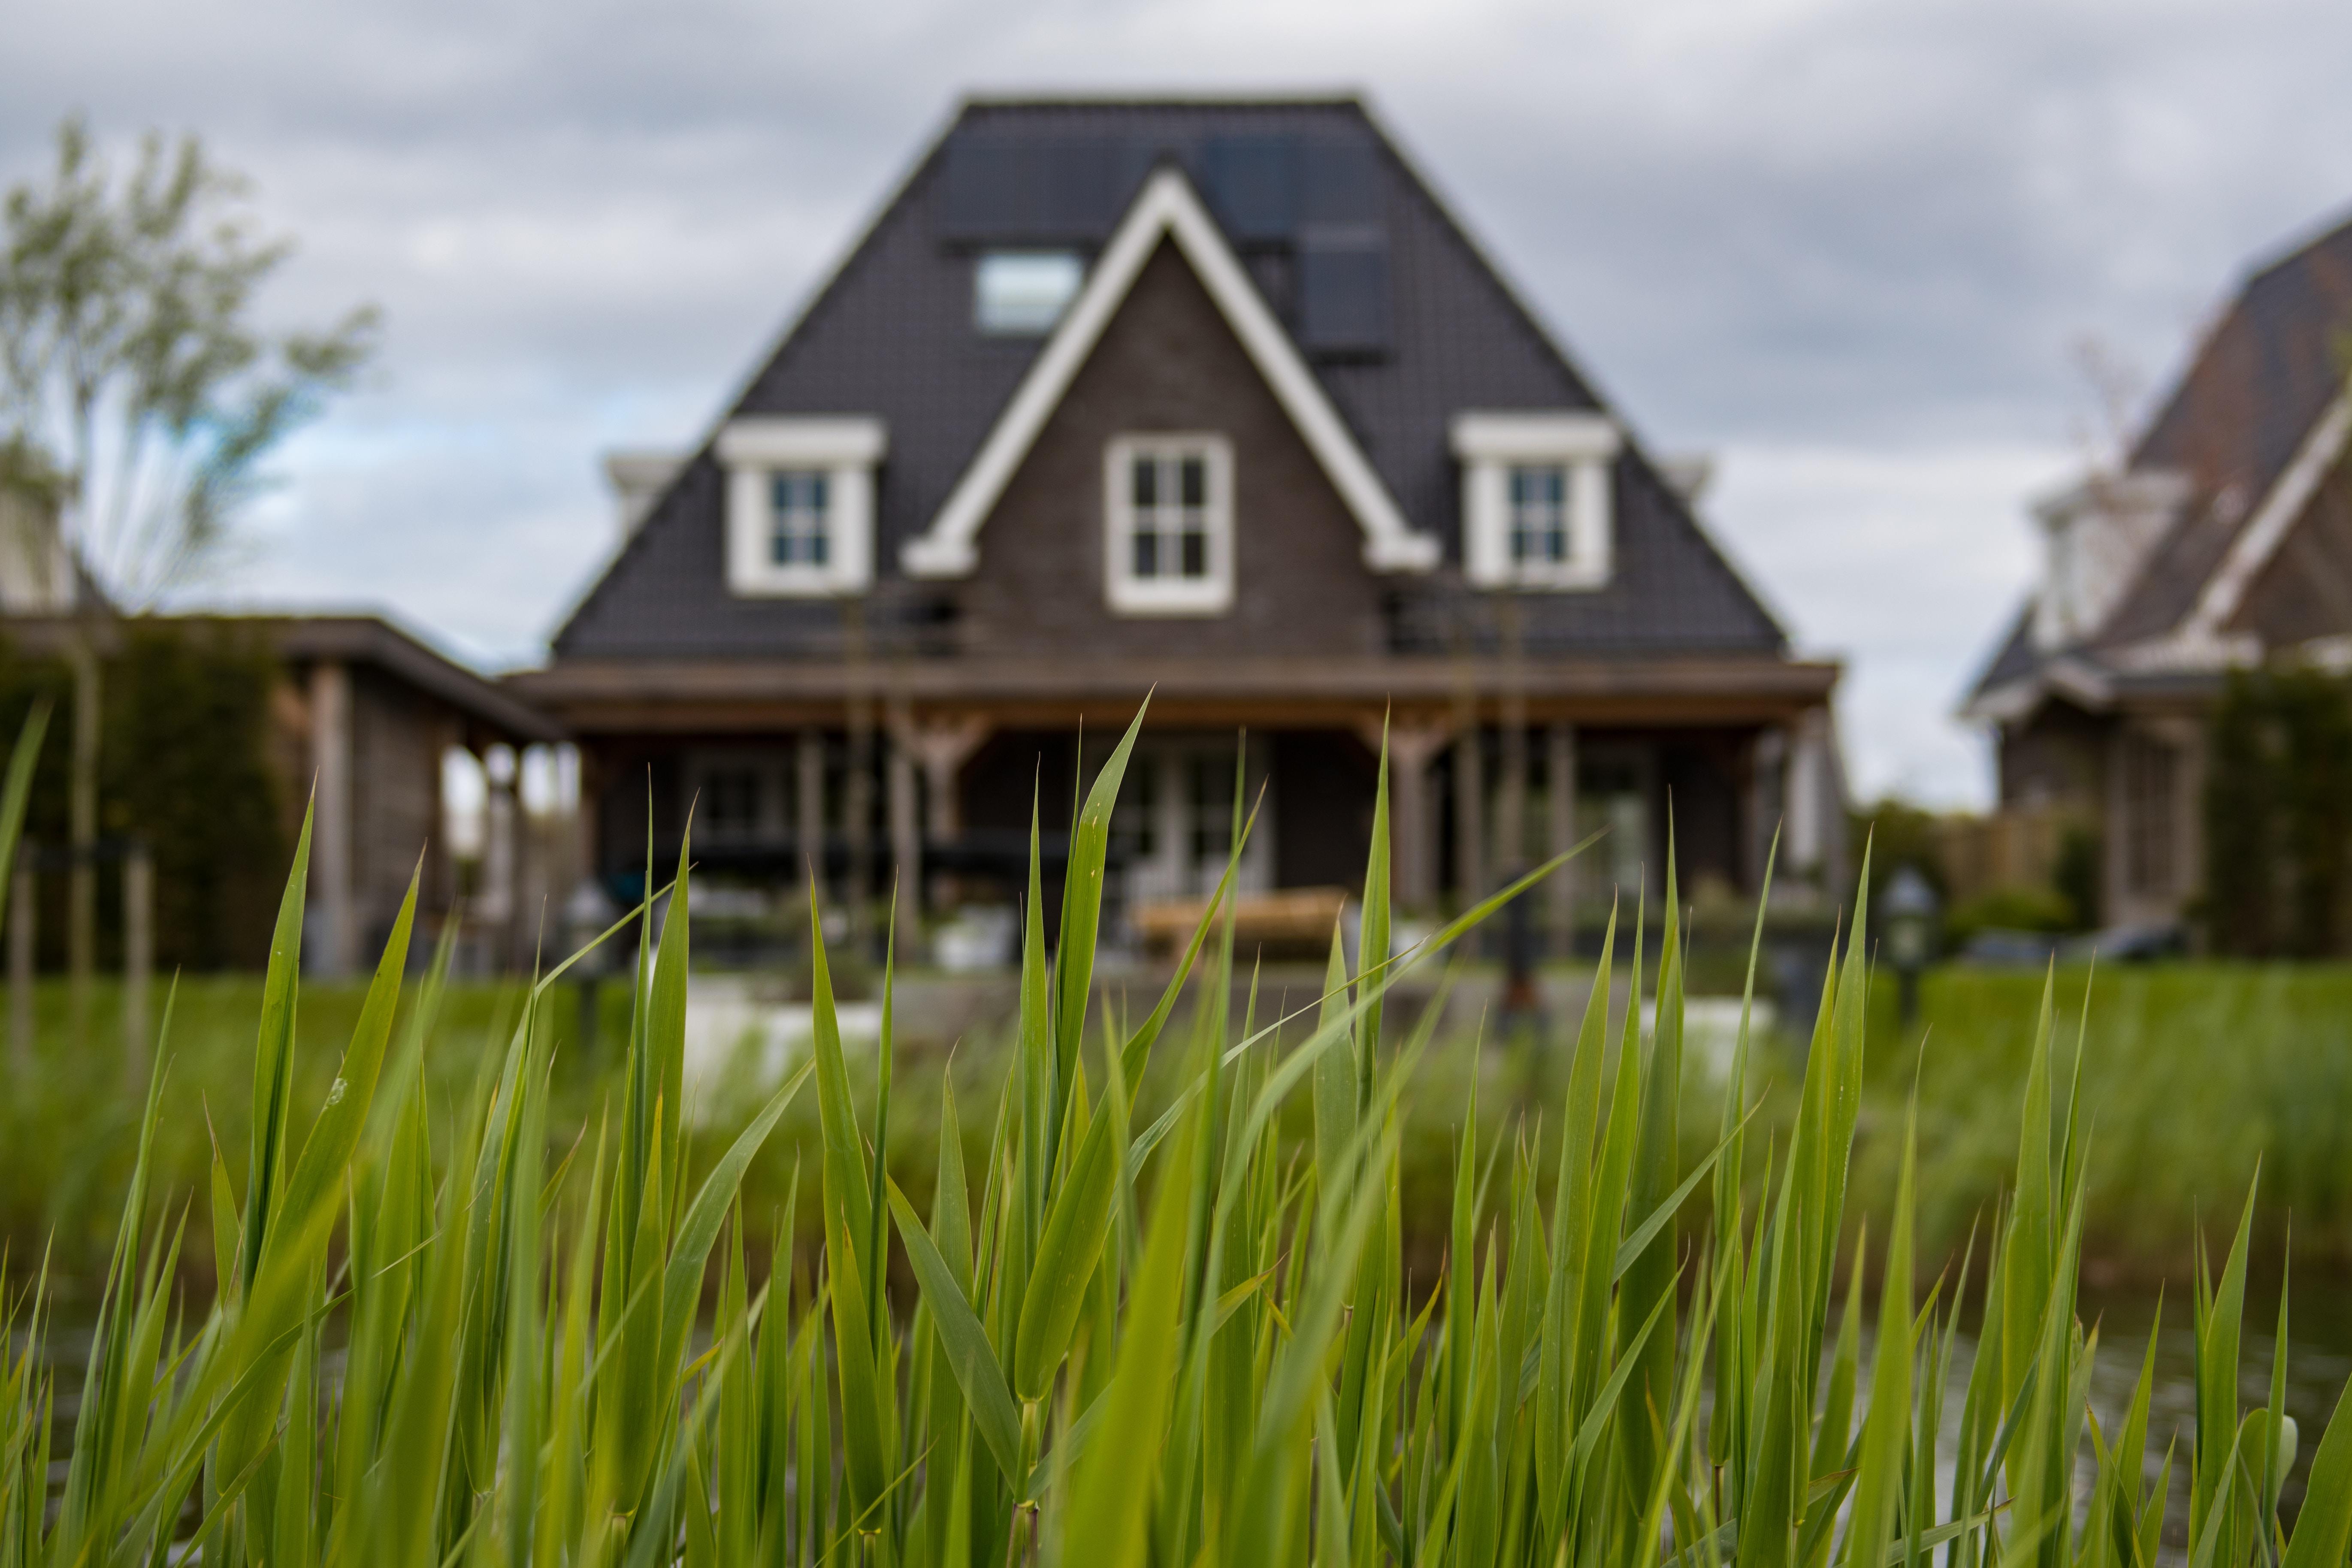 Generic regression - House Price Prediction